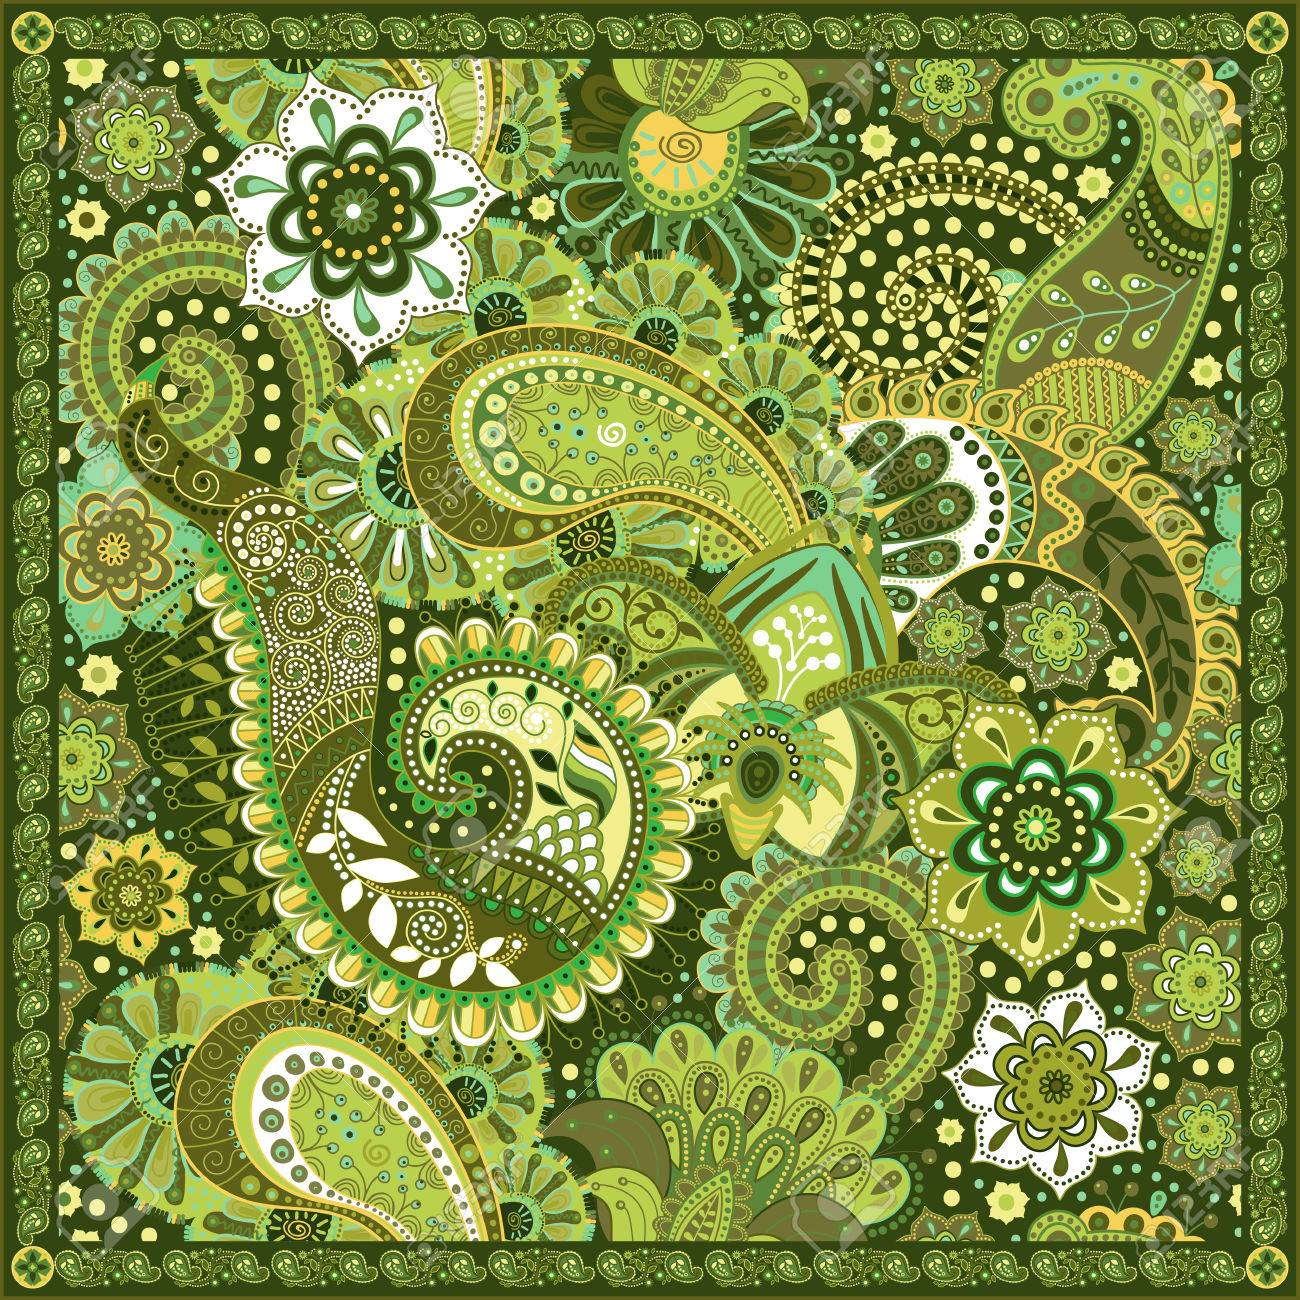 Ornamental colorful pattern, design for pocket square, textile, silk shawl - 49814313